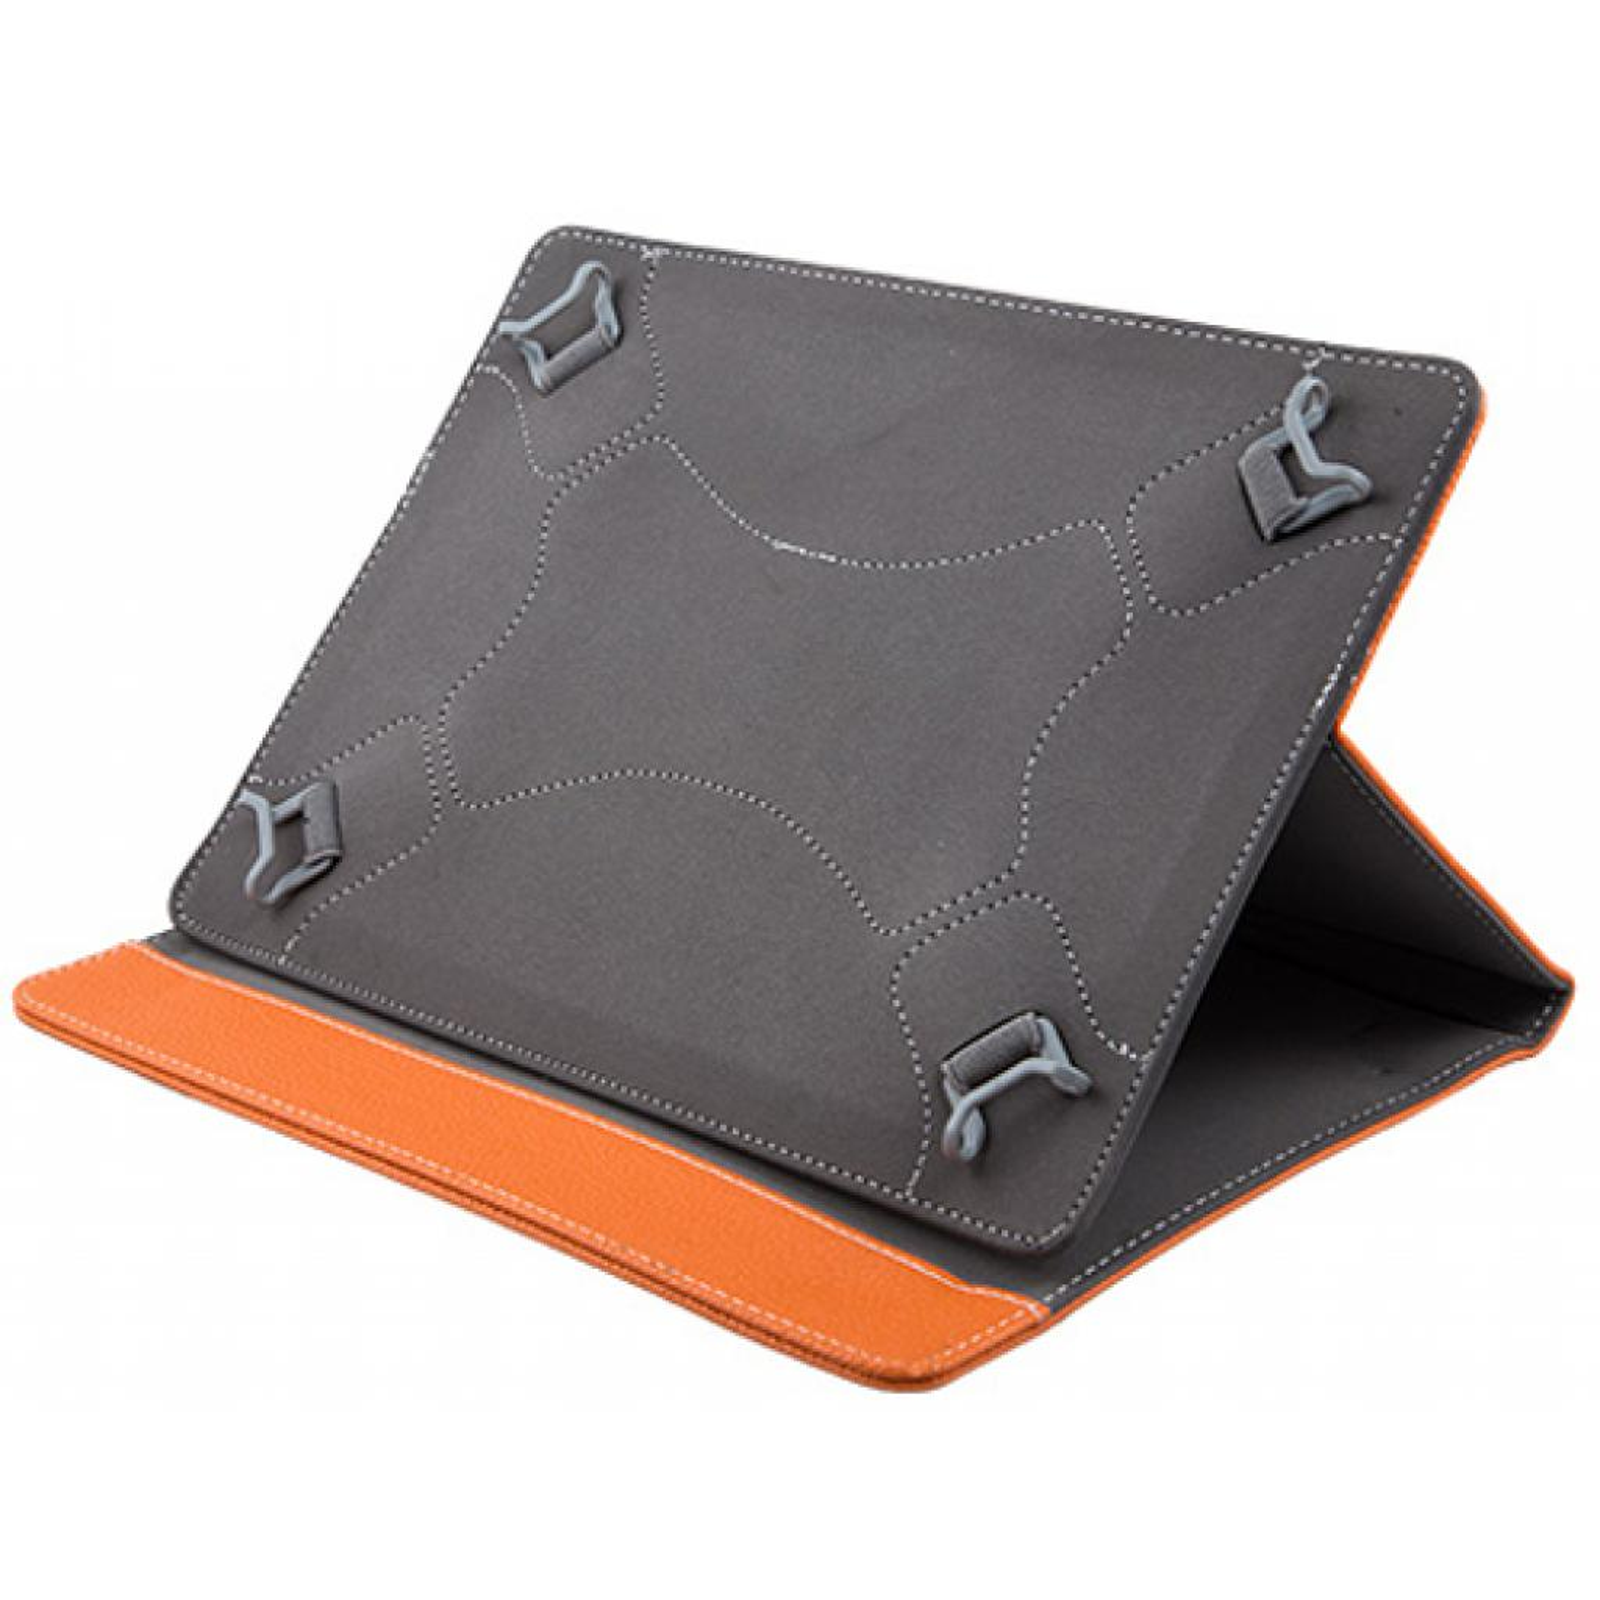 "Чехол для планшета Drobak 10""-10.1"" Universal Stand Orange (216886) изображение 4"